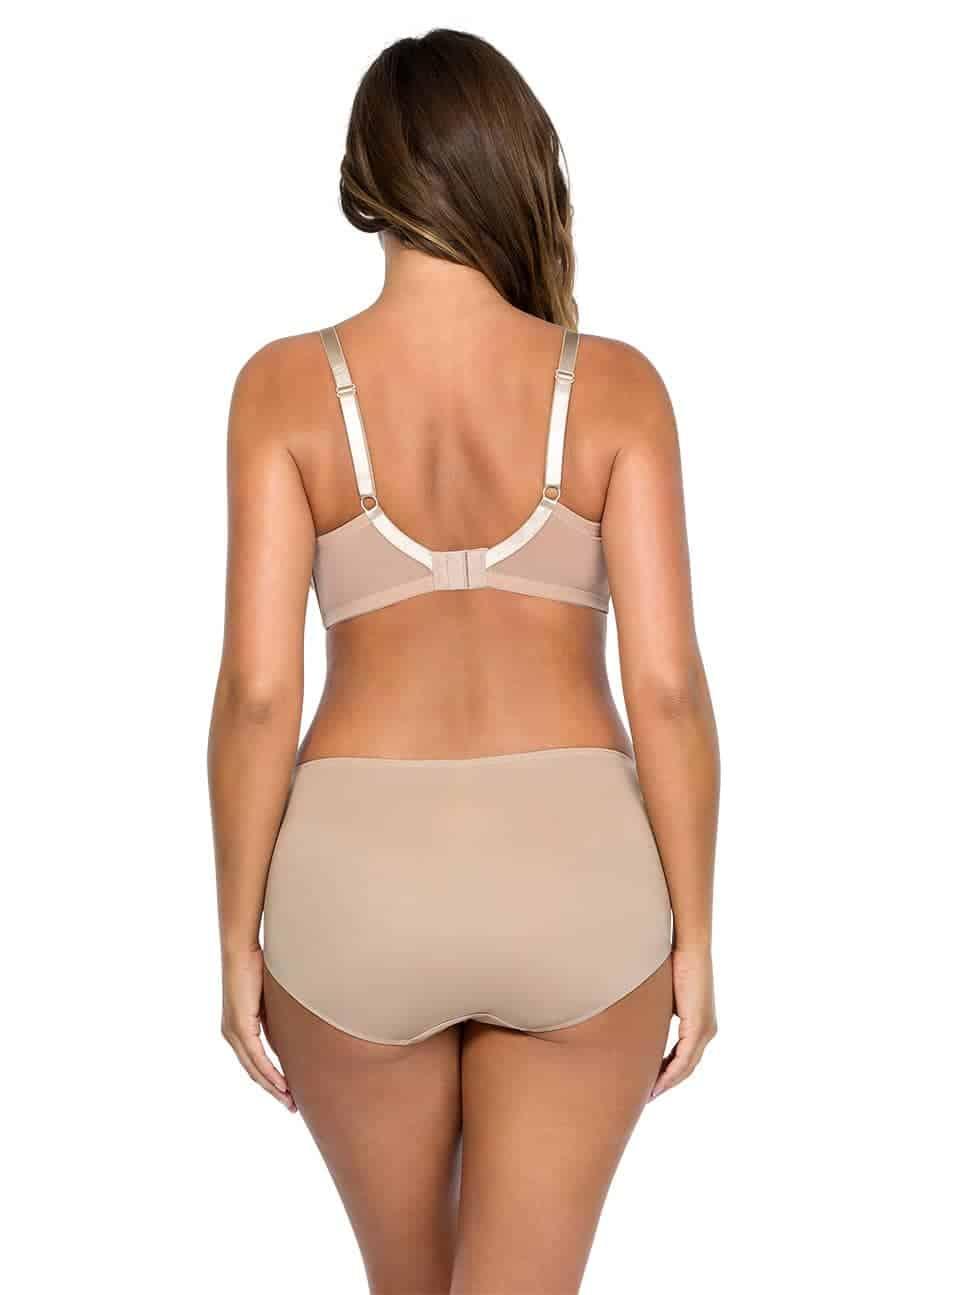 Jeanie StraplessContourBra4815 Hipster4805 ENude Back - Jeanie Strapless Contour Bra - European Nude - 4815